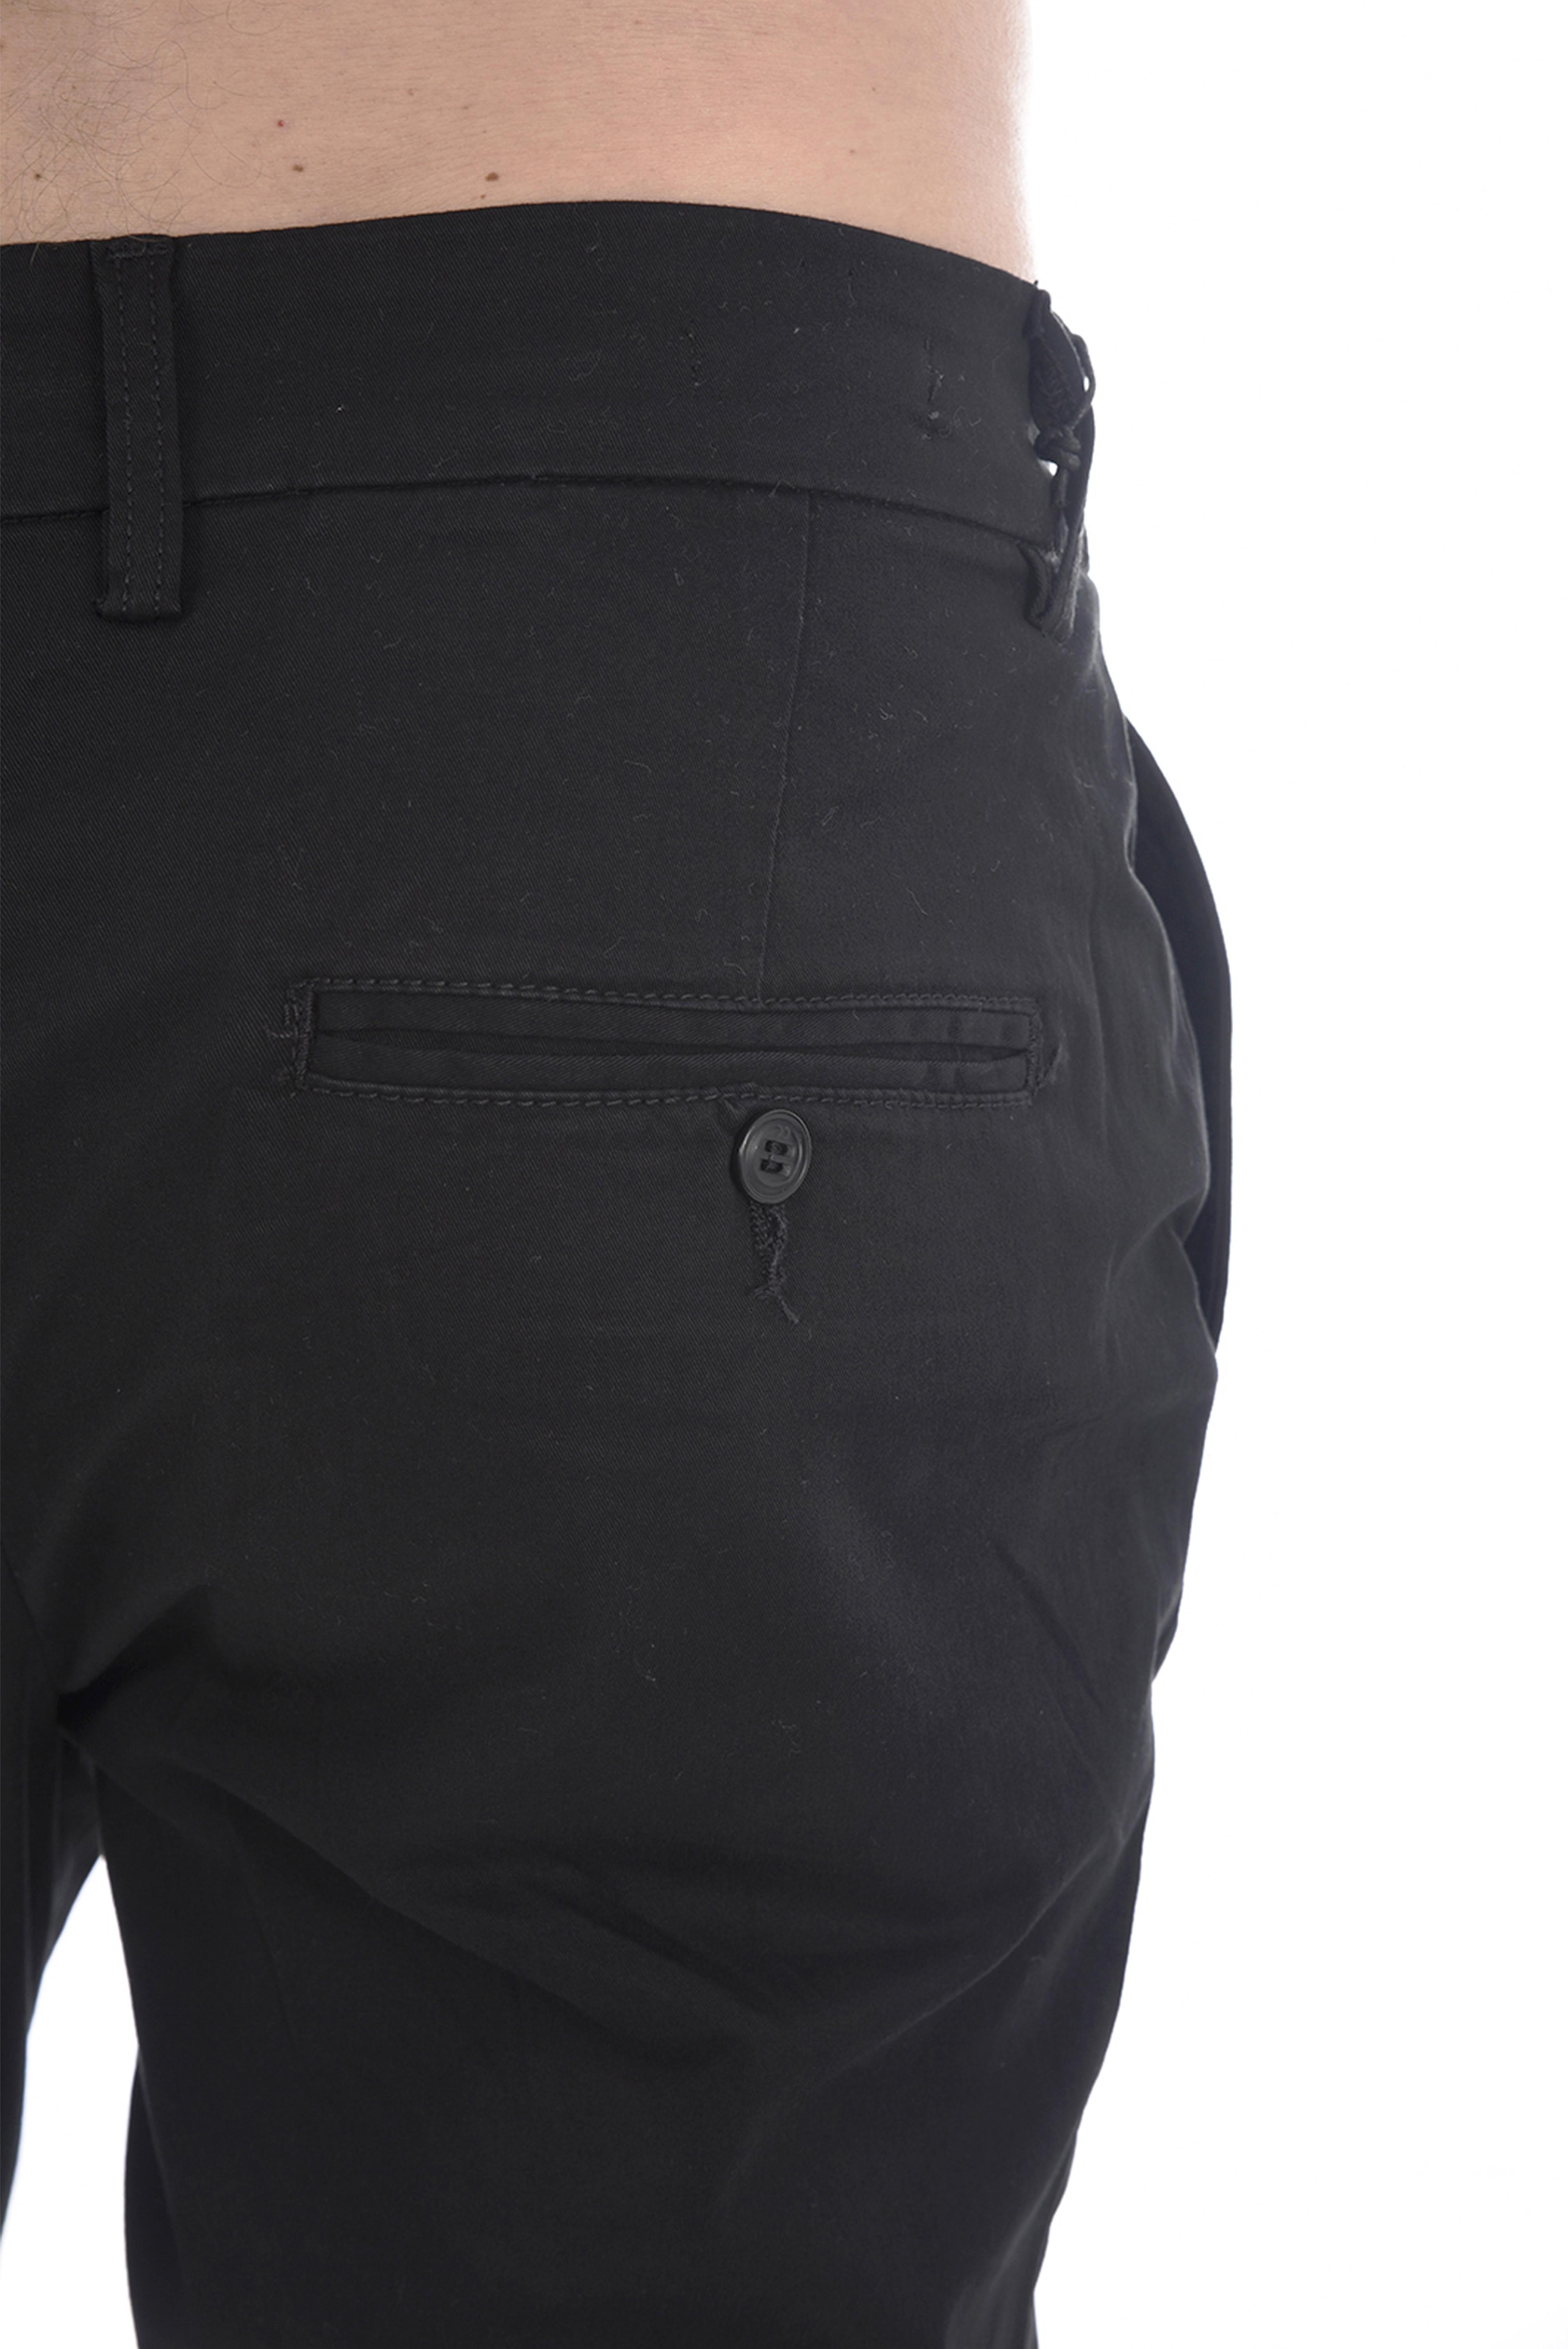 Pantalons chino/citadin  Jack & Jones ROBERT CAM AKM BLACK